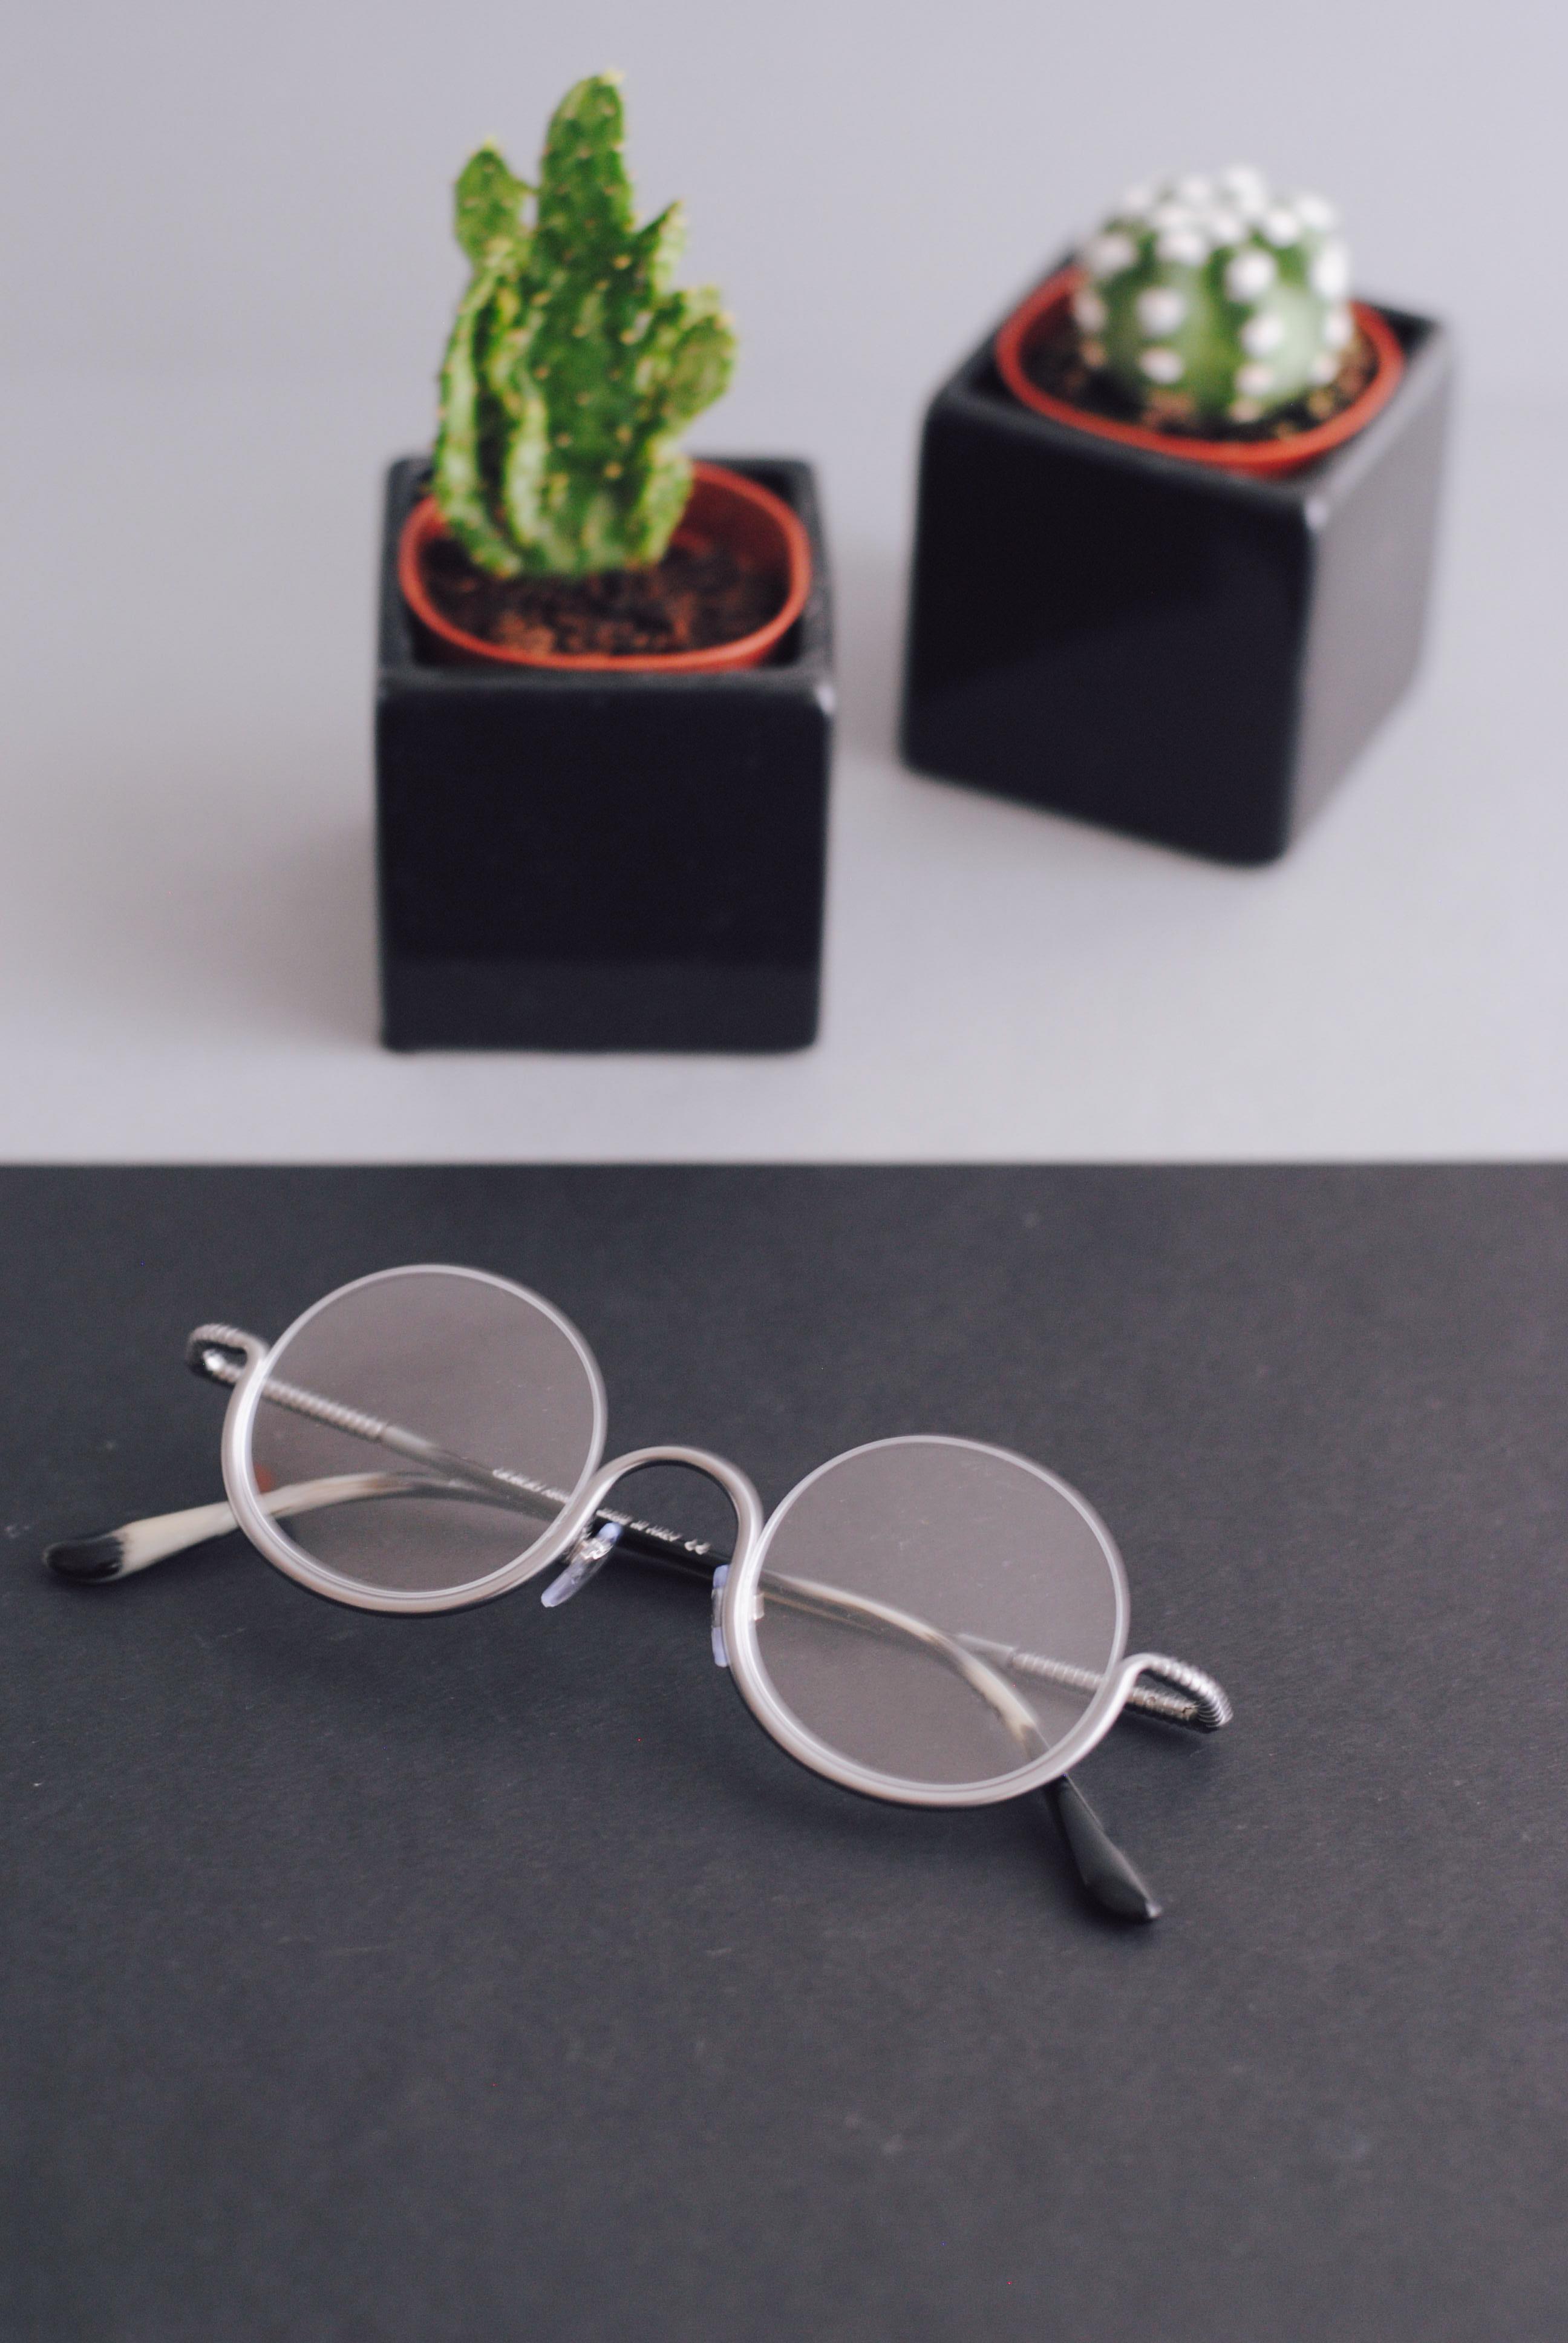 d1700a9e8a9d movember eyeglasses giorgio armani movember eyeglasses giorgio armani  prescriptions